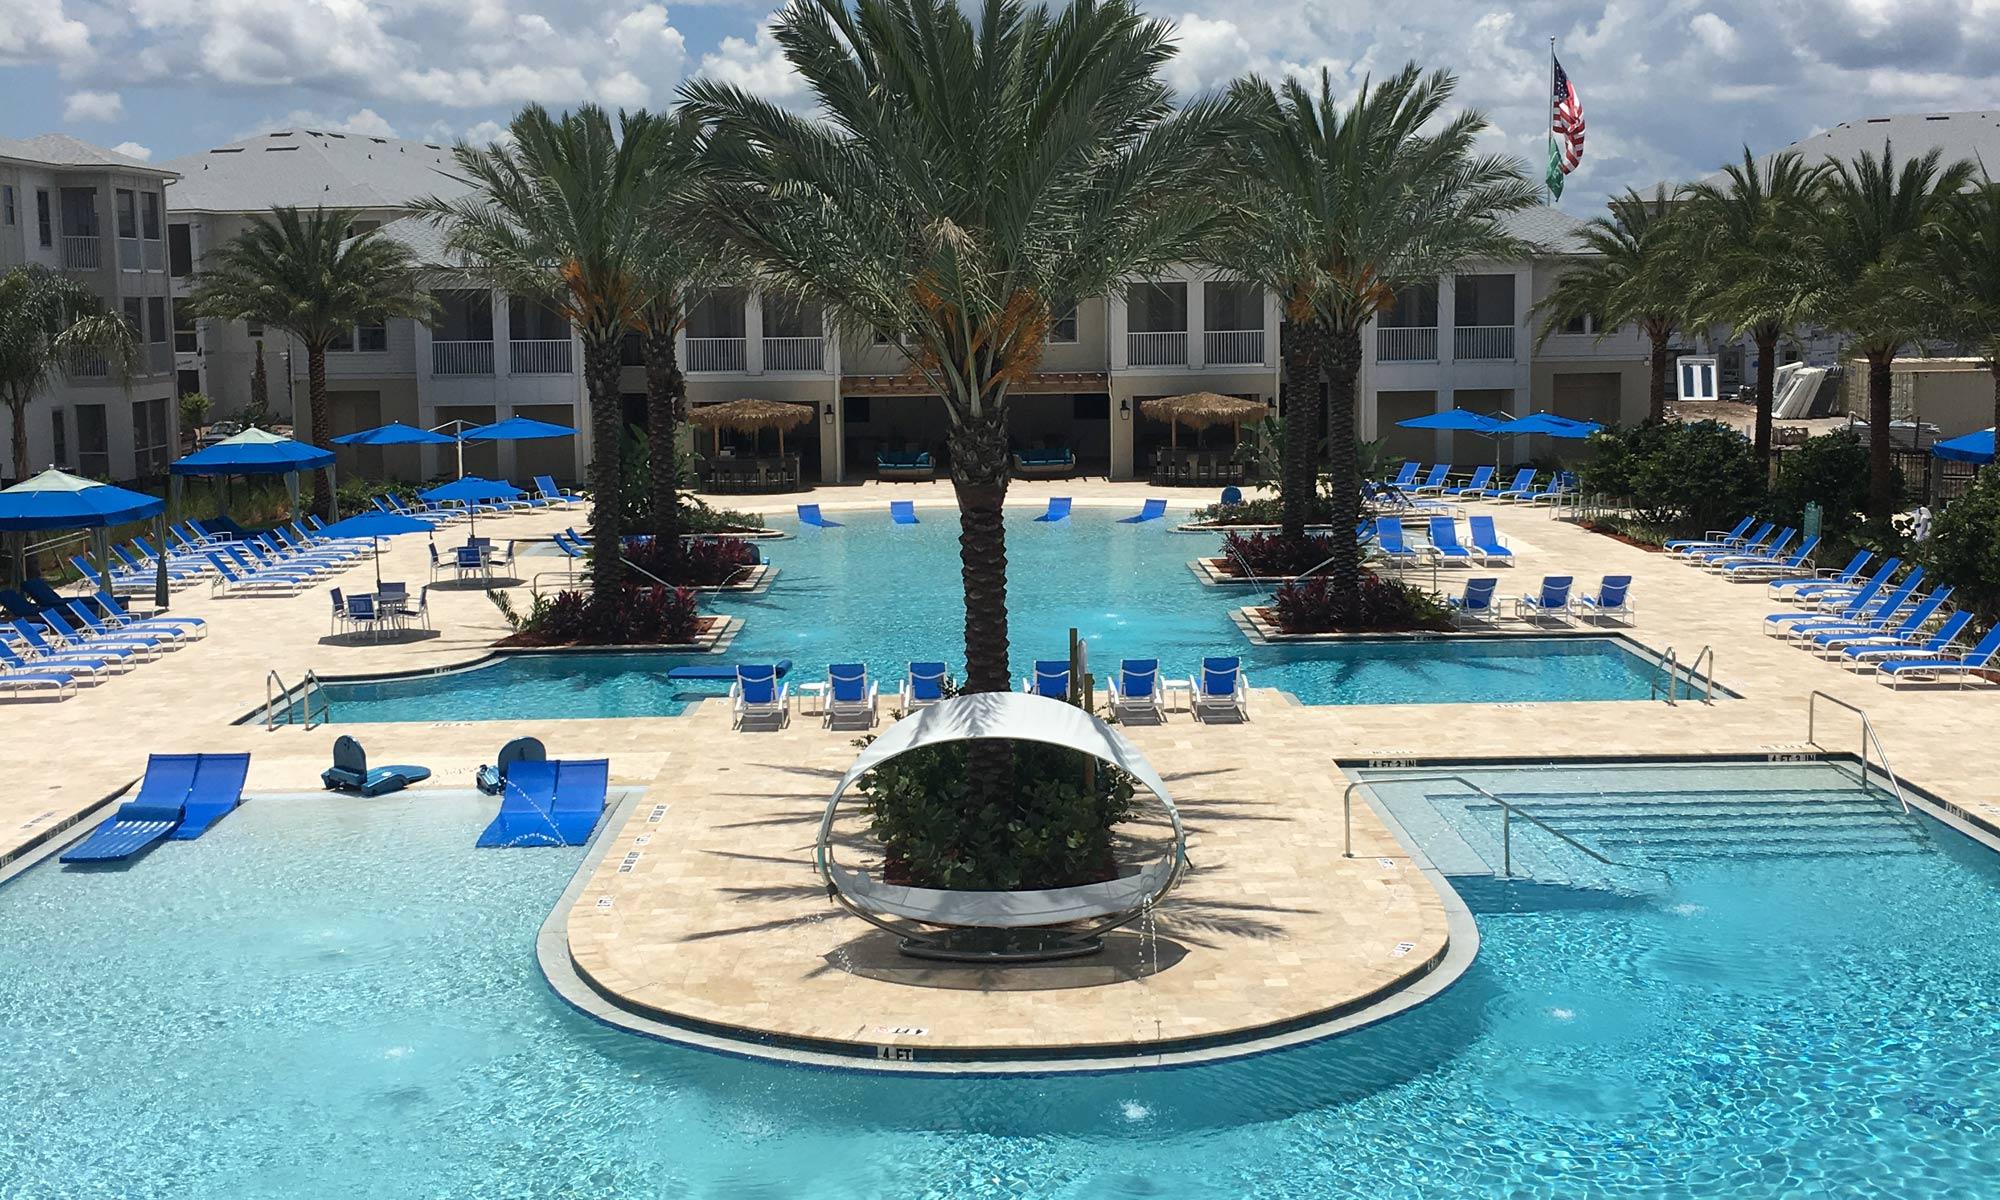 Apartments For Rent In Jacksonville Fl In Bartram Park